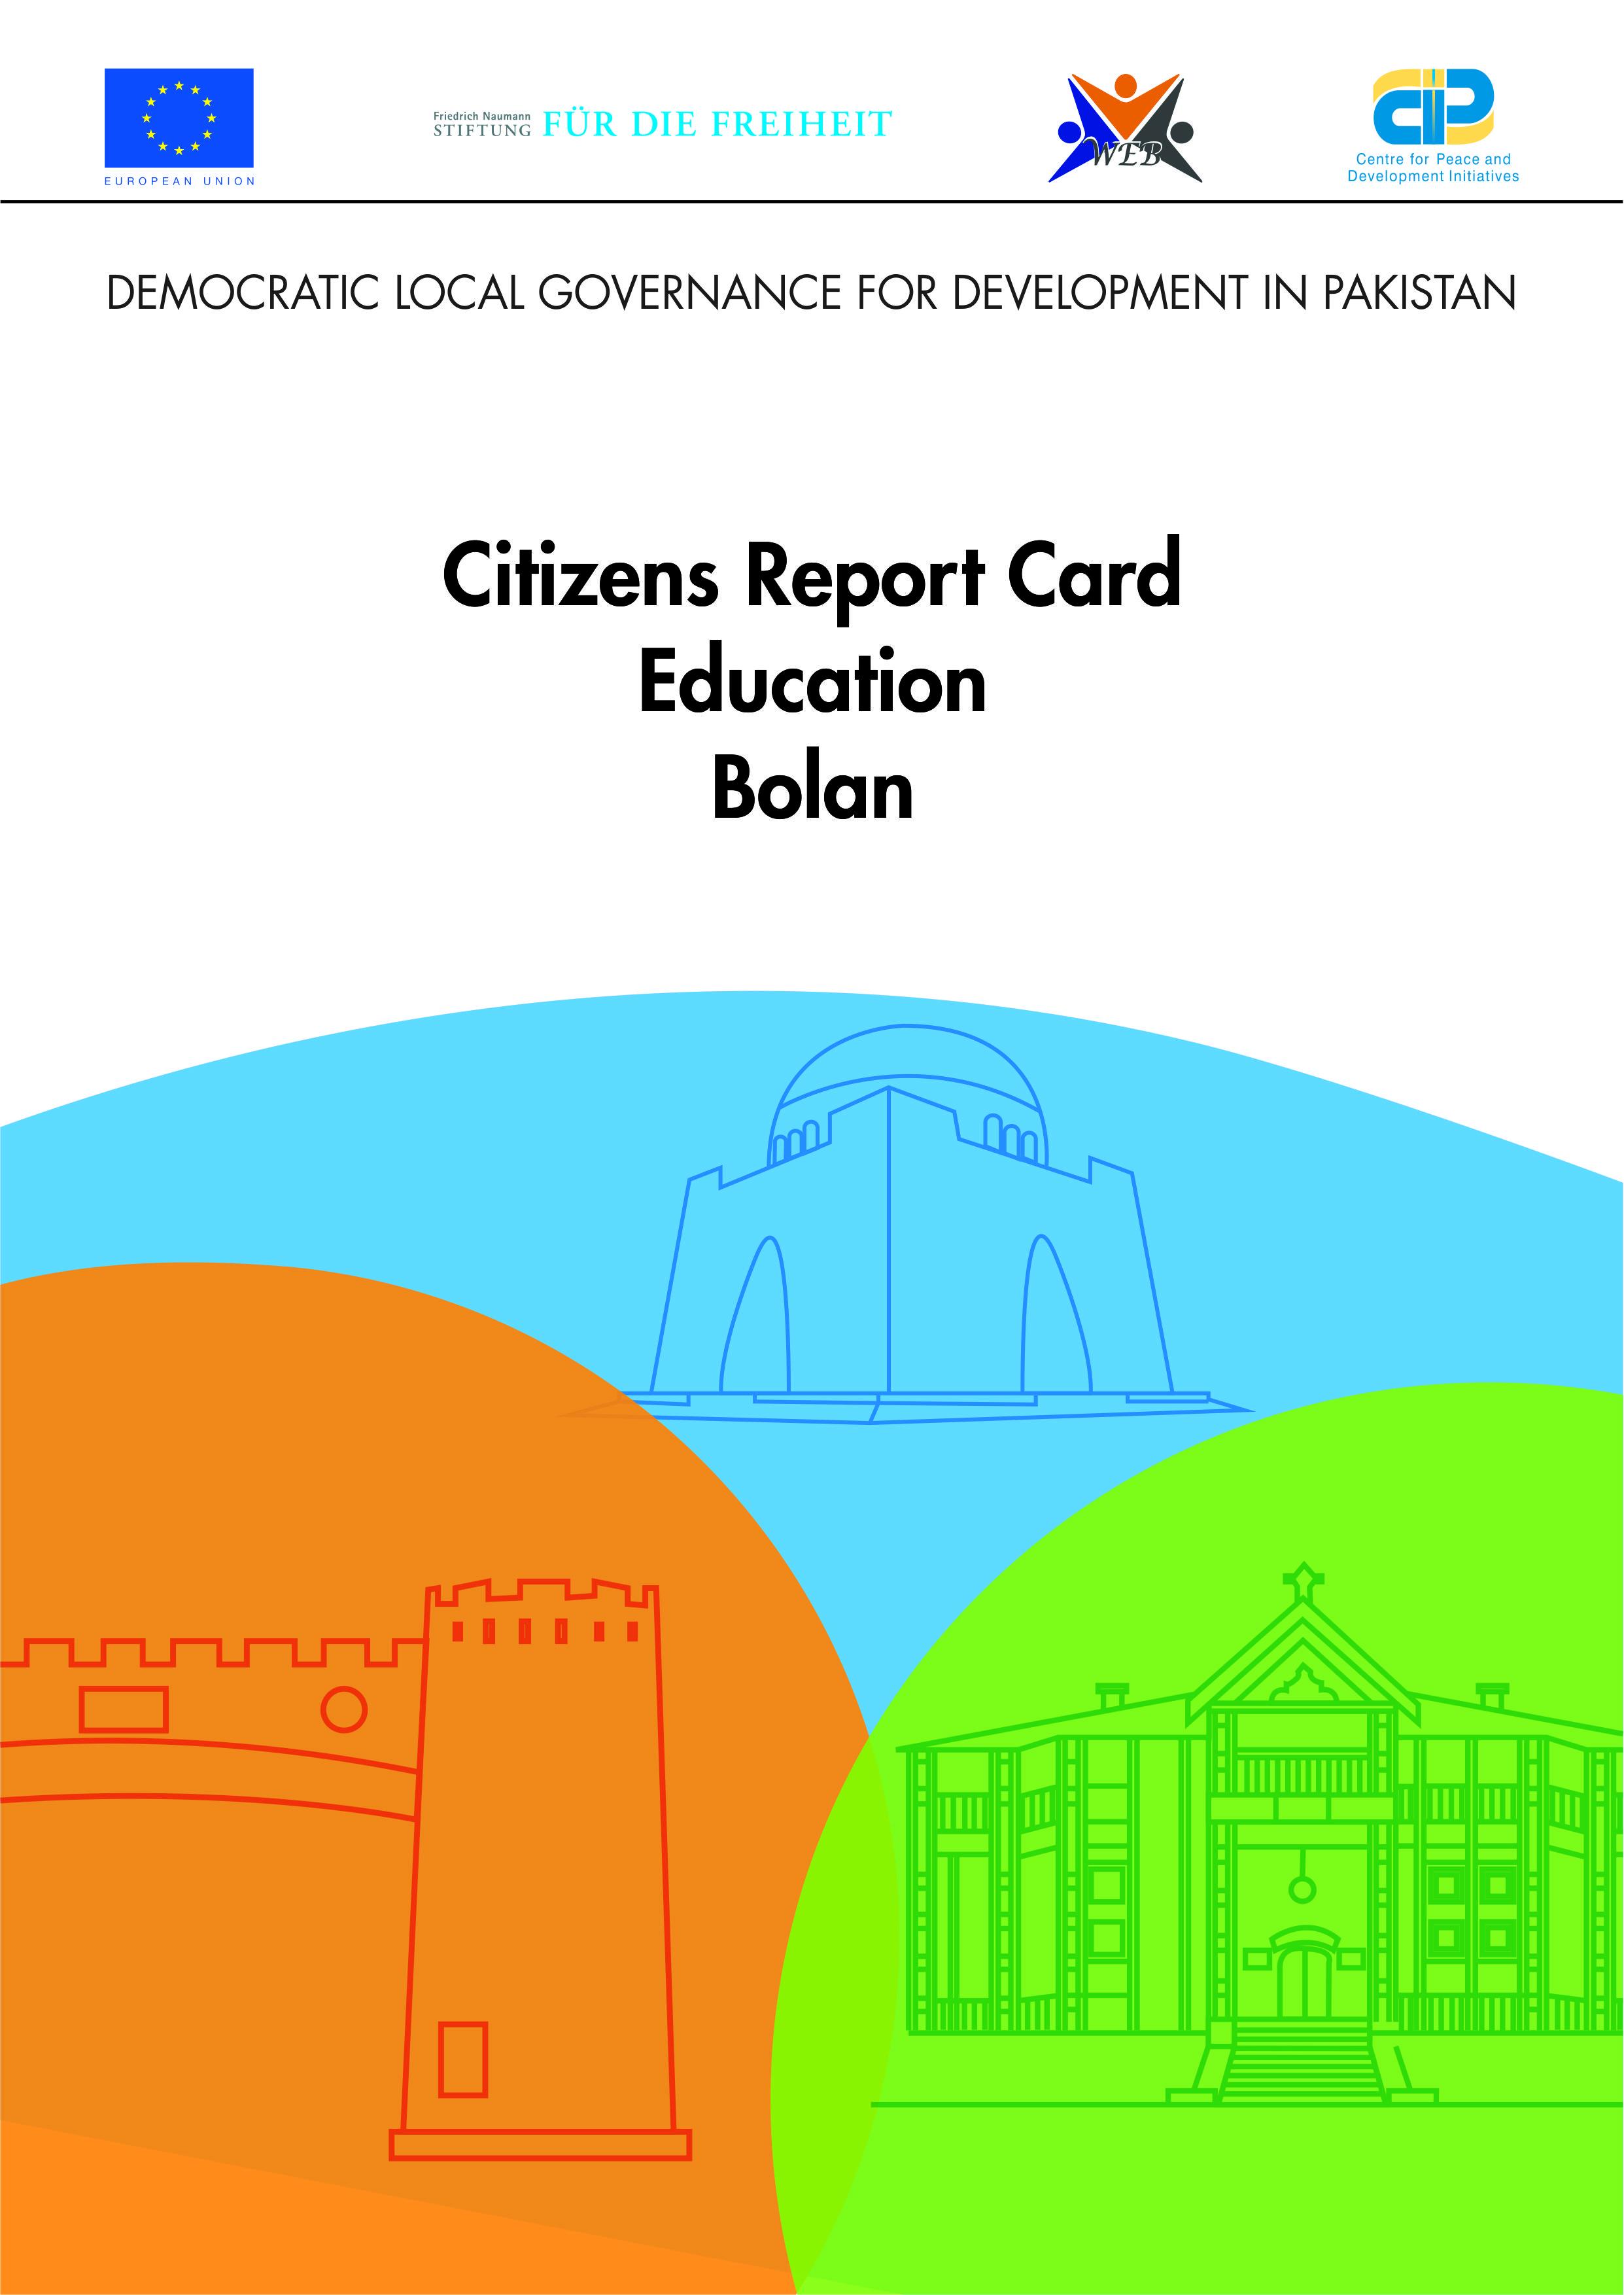 Citizen Report Card Bolan 2017-18